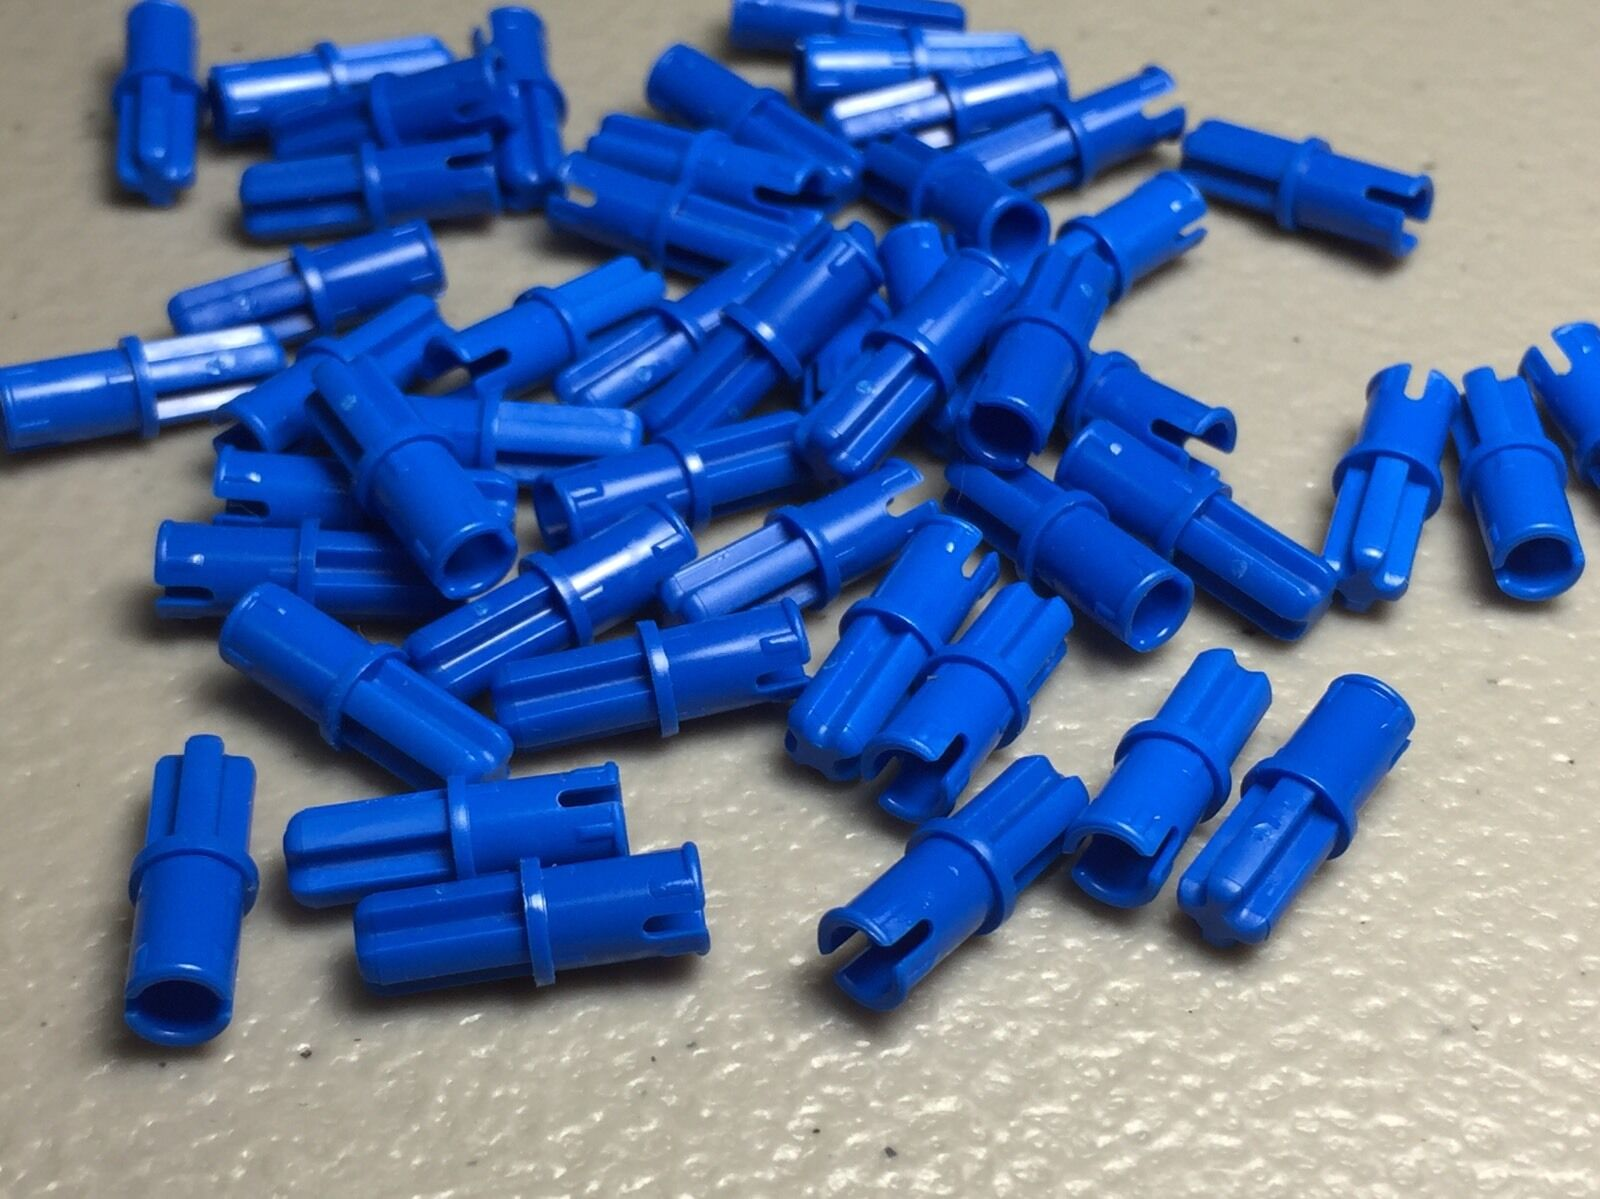 Verbinder blau lang Technic Pin 42924 200 x LEGO 6558 Pins -NEU-